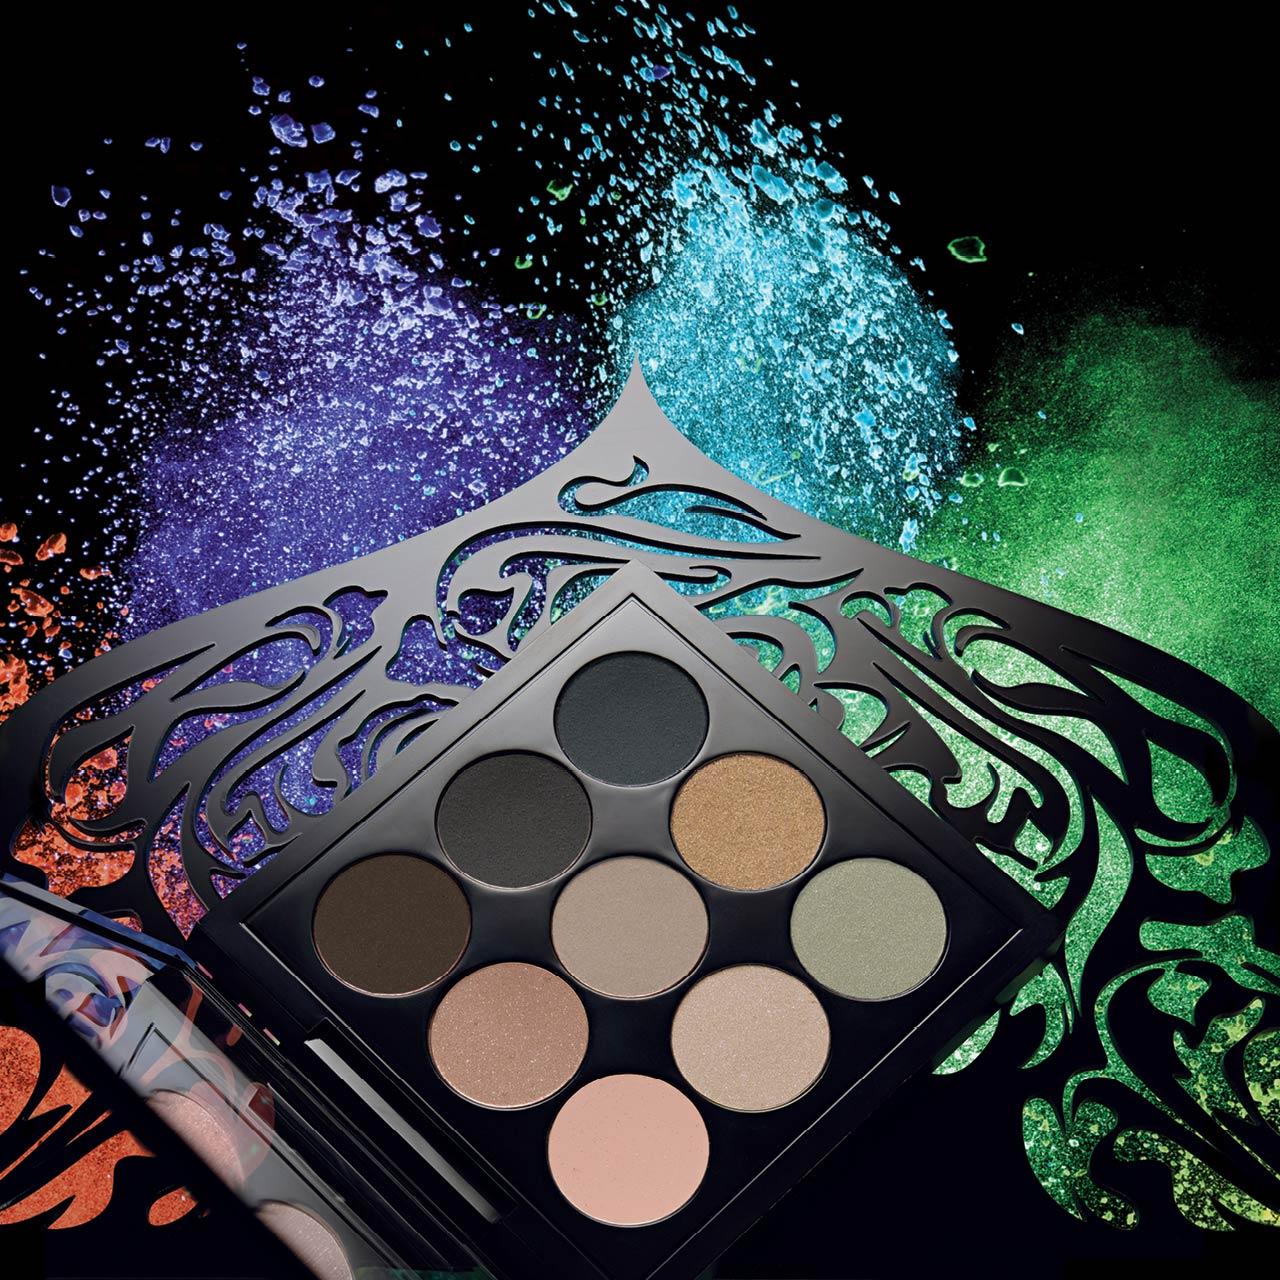 Mac Eid Mubarak Eyeshadow Palette For Ramadan 2016 News